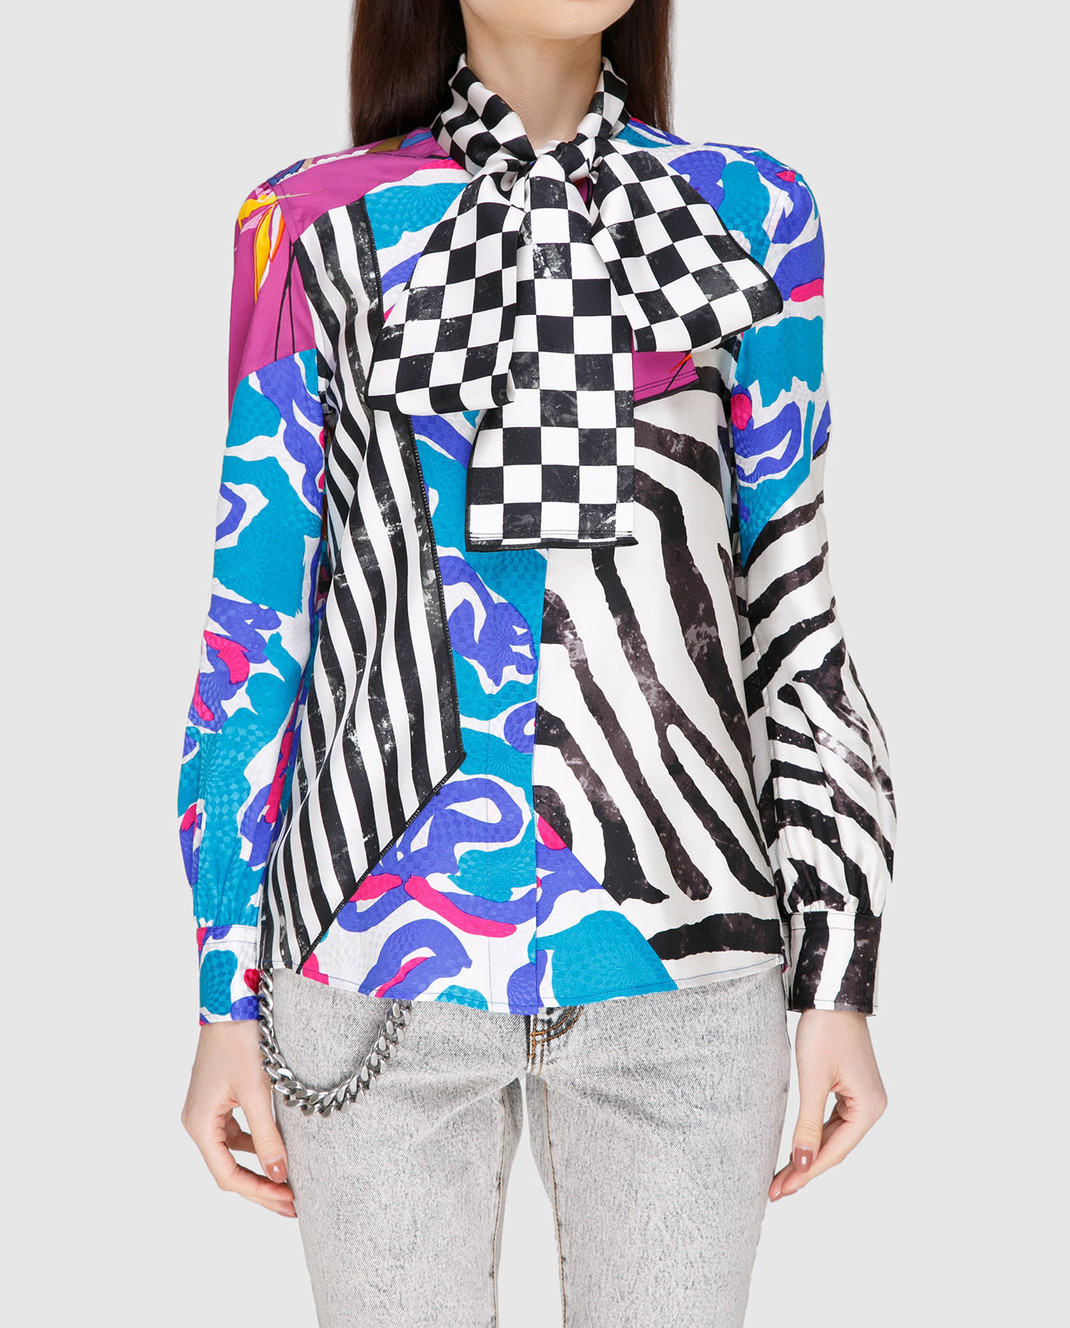 Marc Jacobs Блуза из шелка W51650646 изображение 2